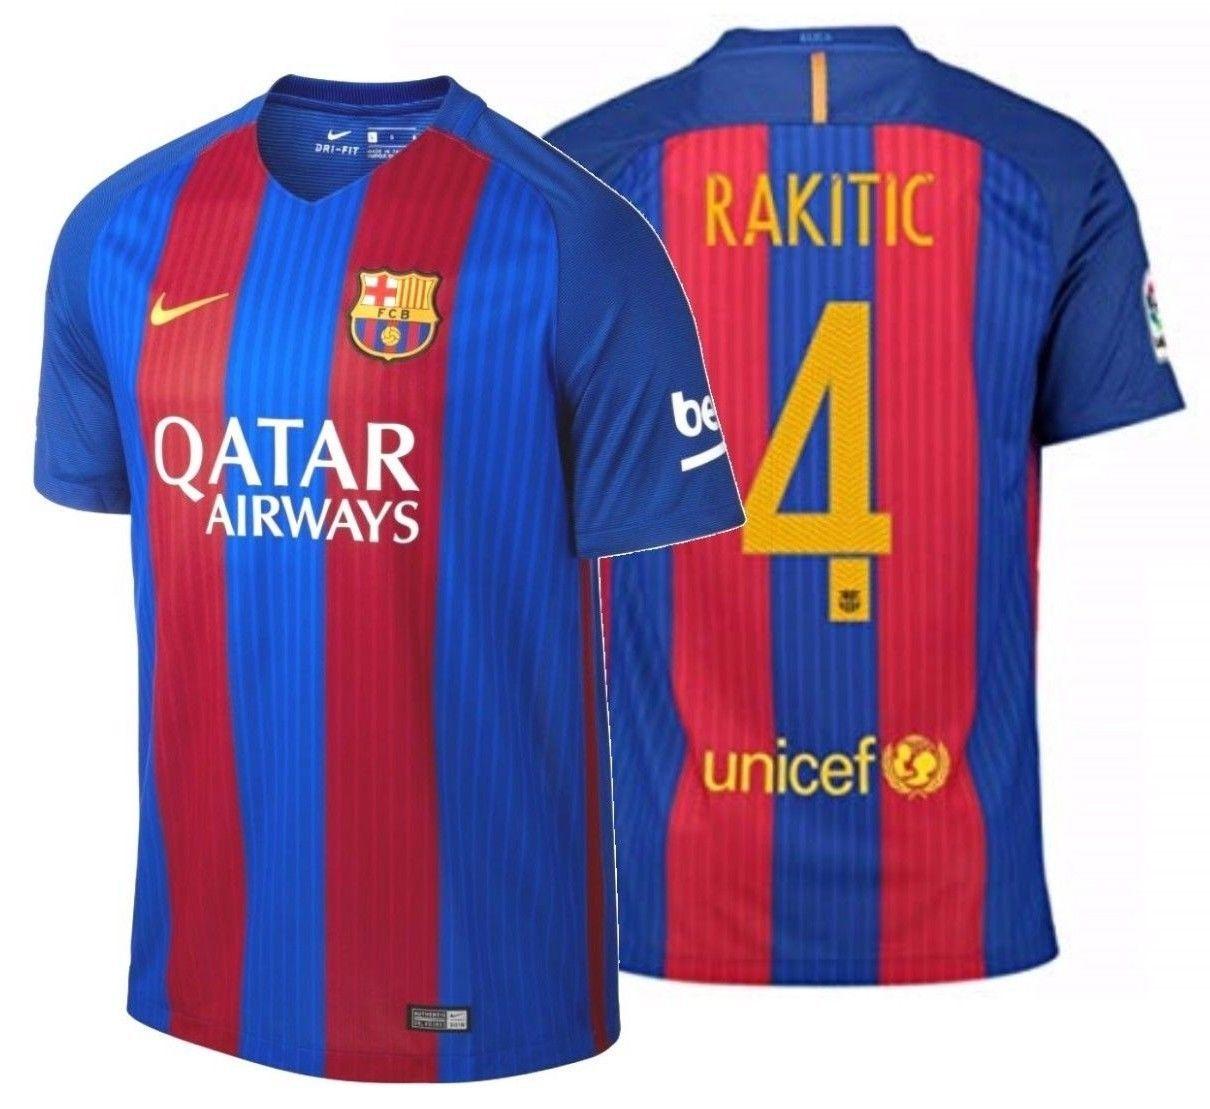 5db978aaac9 Nike Ivan Rakitic Fc Barcelona Home Jersey and 50 similar items. 57